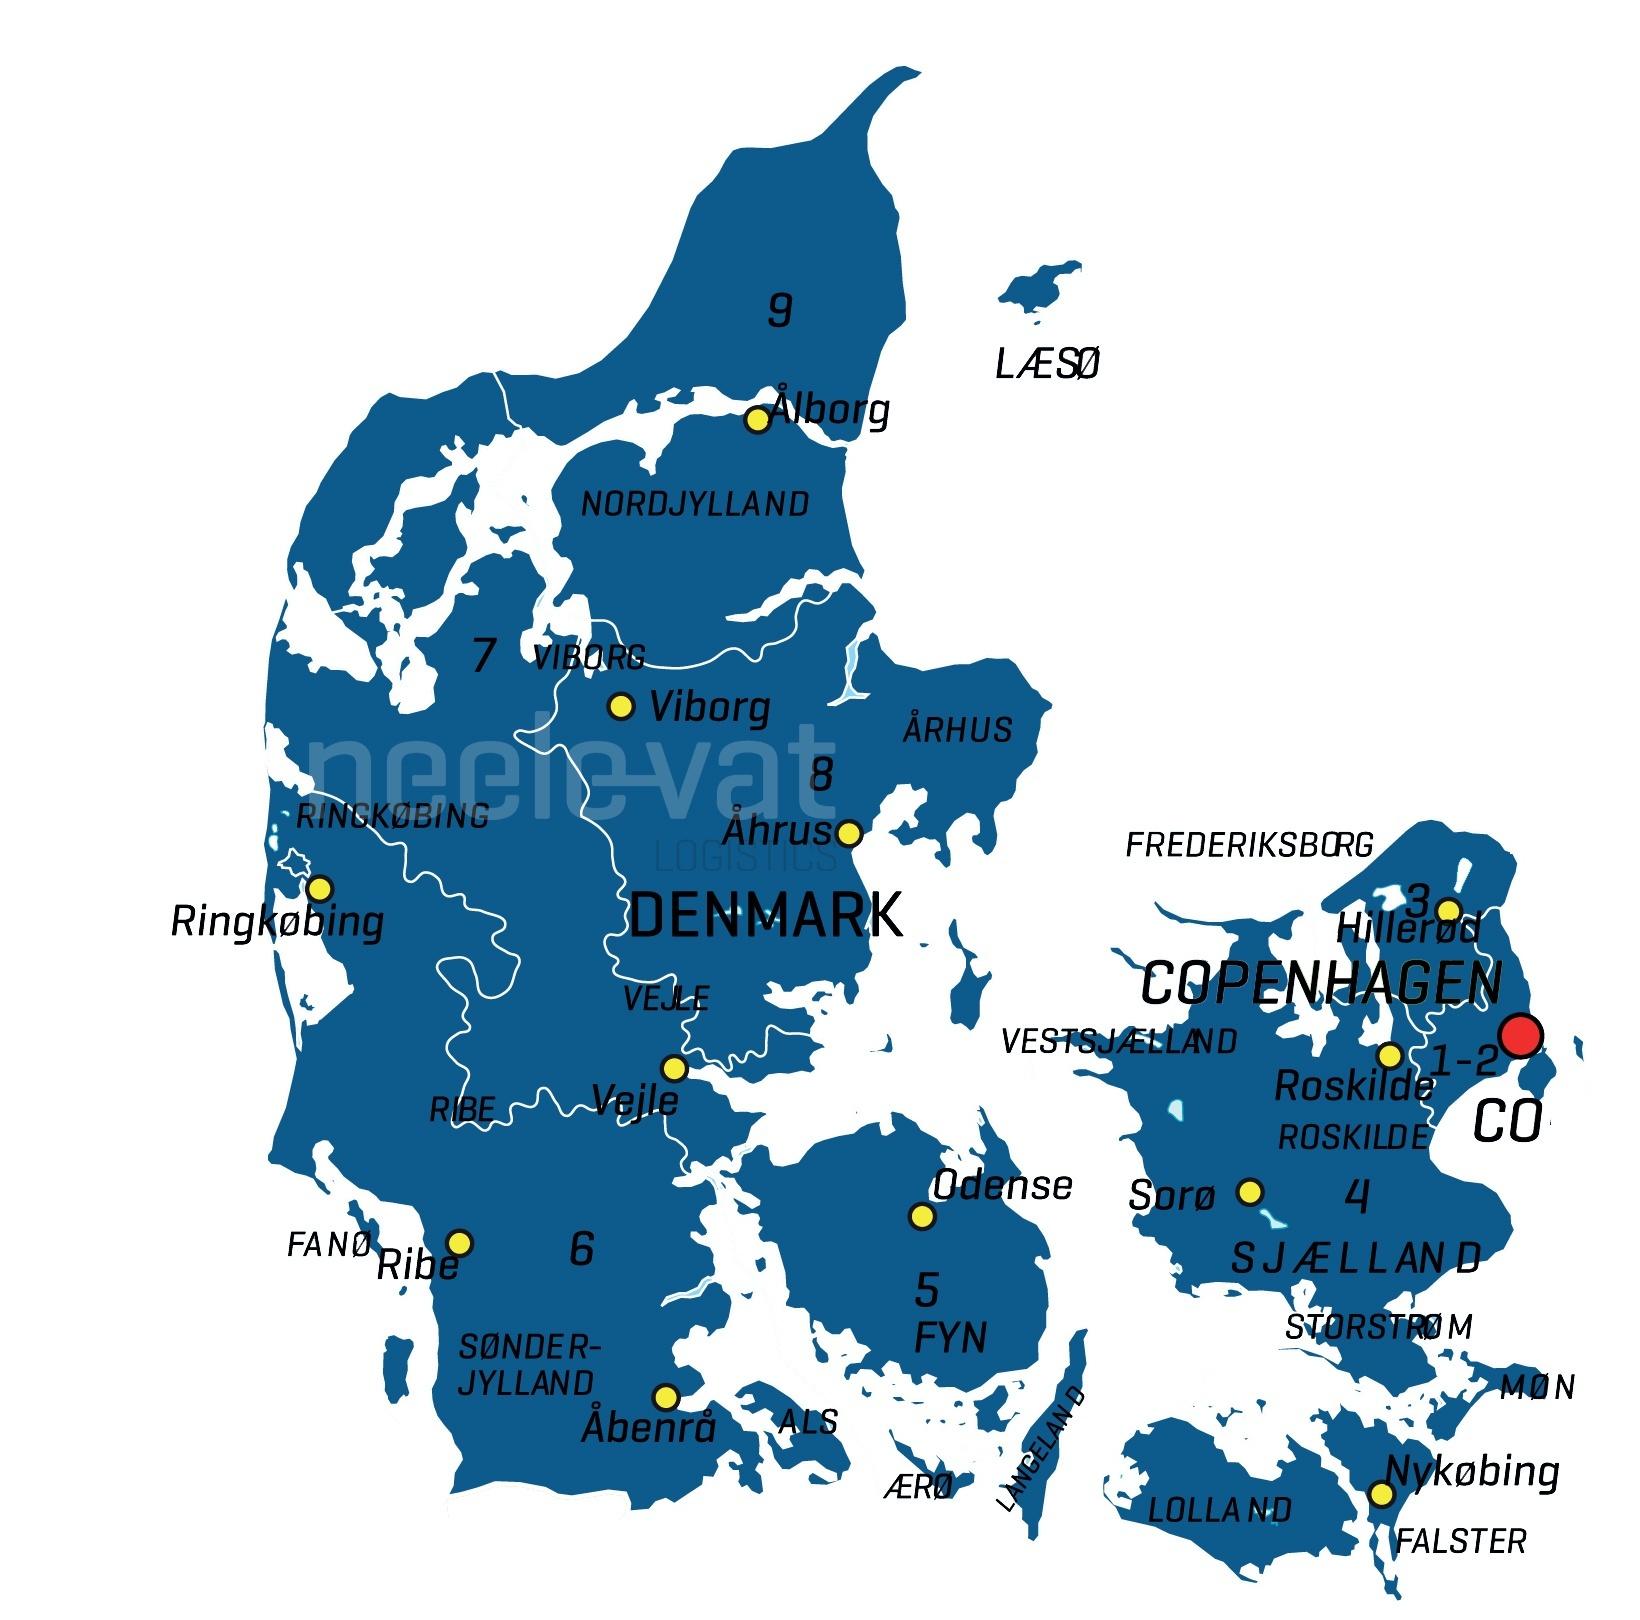 postcode Denemarken